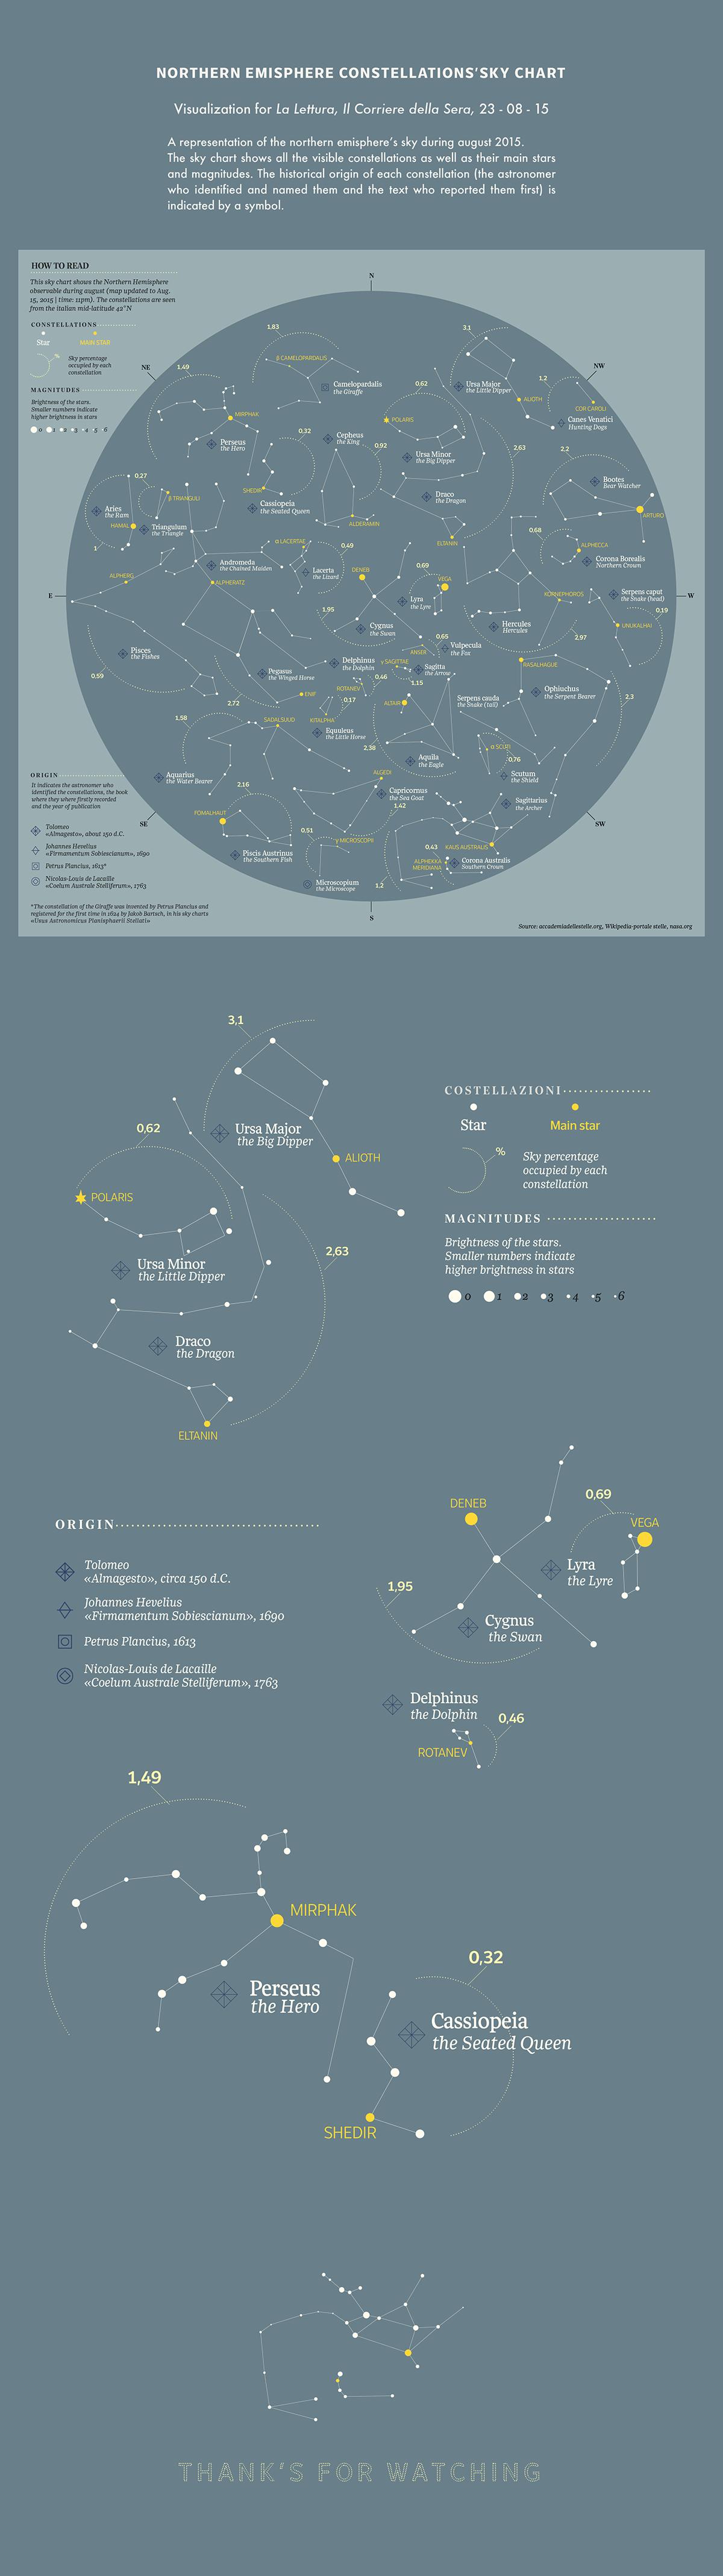 sky chart,sky map,constellation,astronomy,astronomist,Space ,globe,zodiac,northern emispere